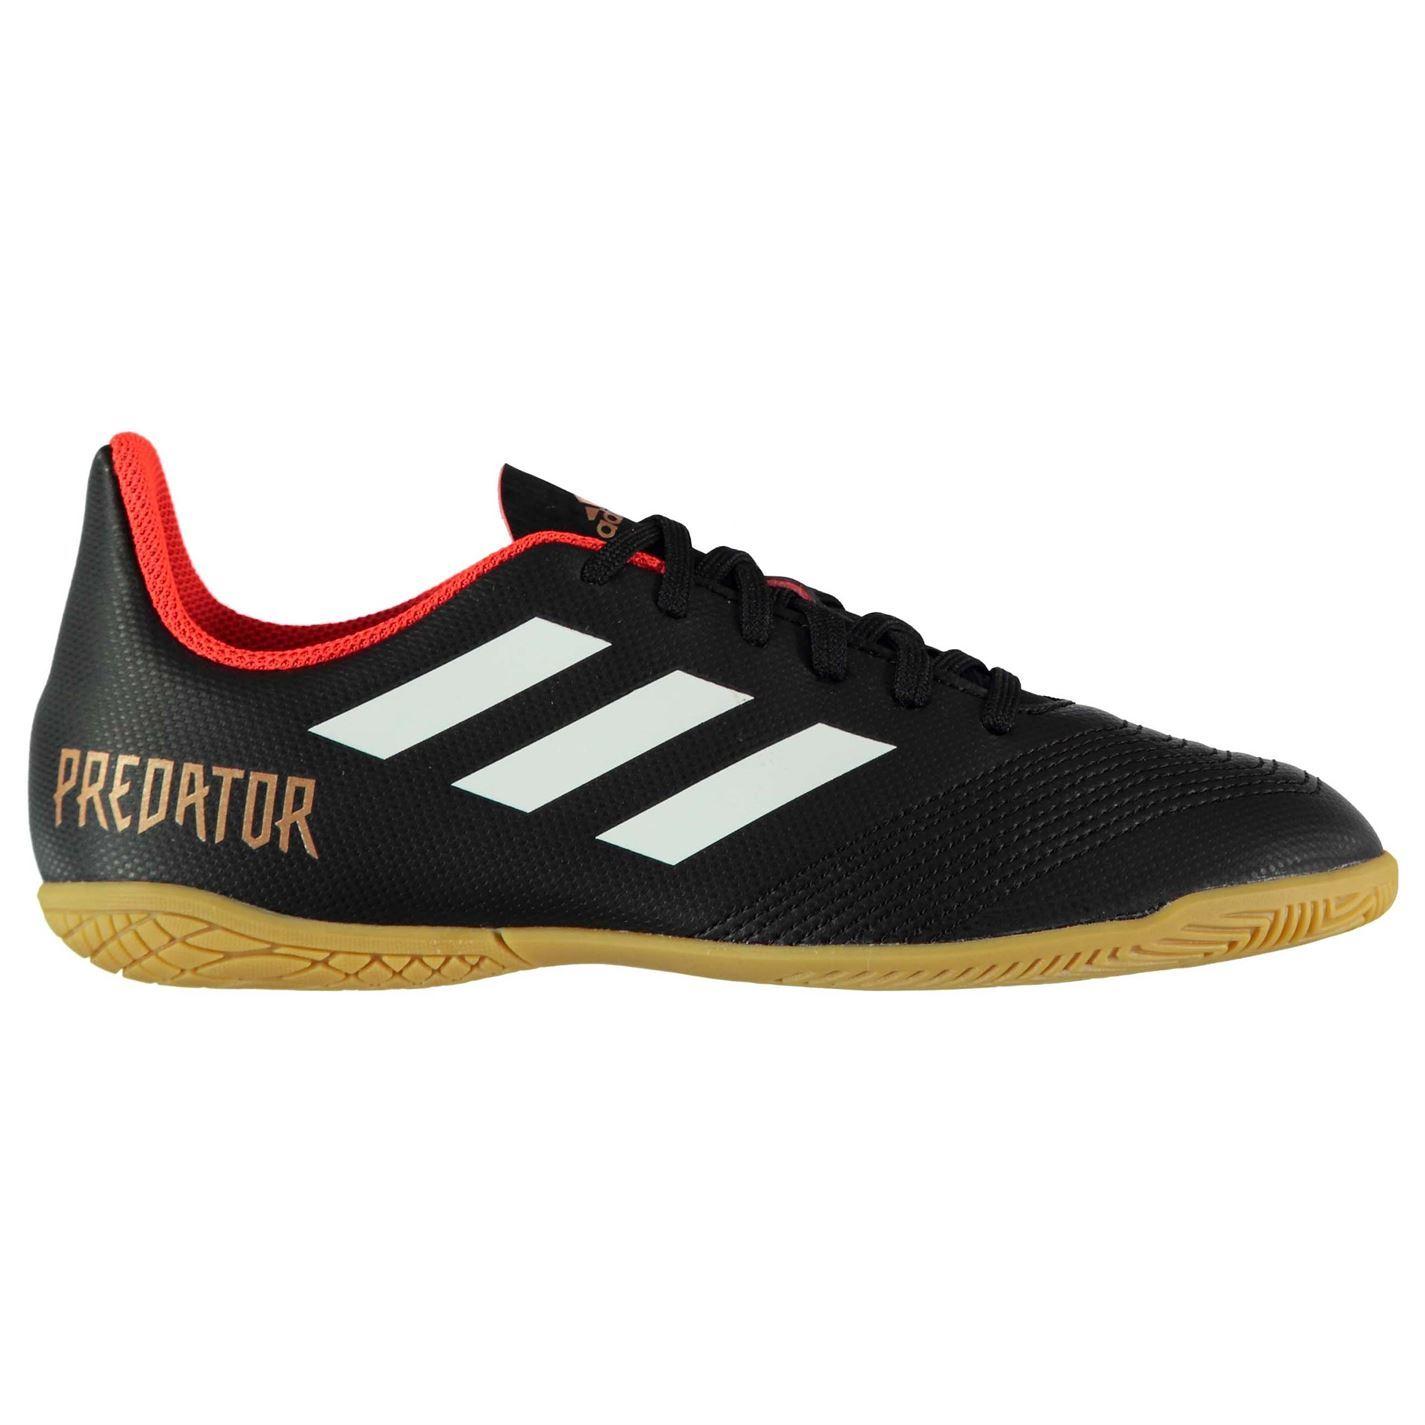 c762c60fe5ed ... adidas Predator Tango 18.4 Indoor Football Trainers Juniors Black  Soccer Shoes ...